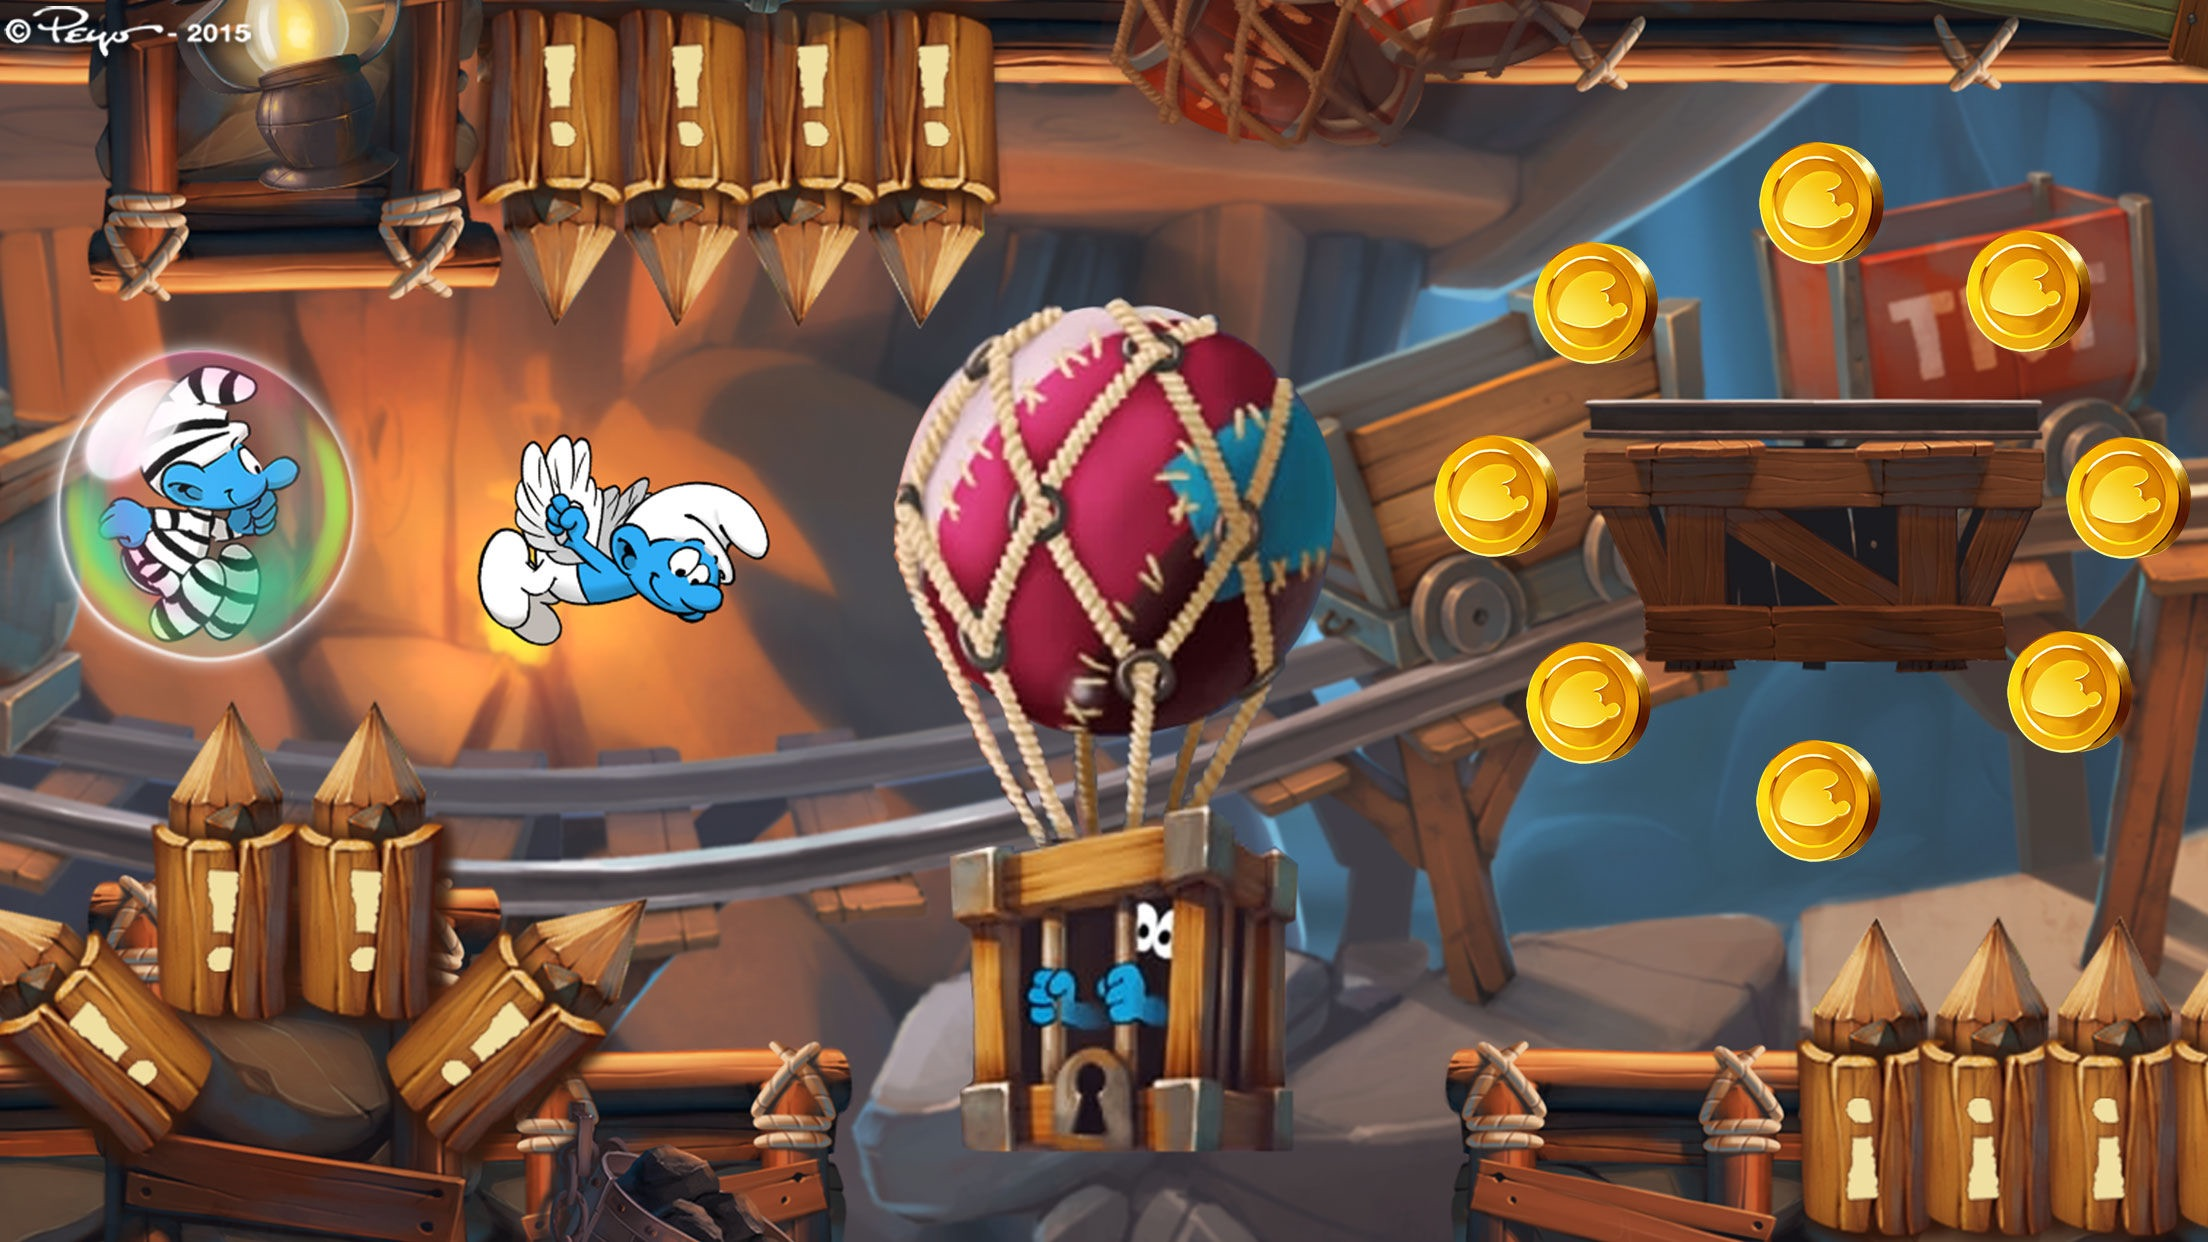 Smurfs Epic Run - Fun Platform Adventure Screenshot